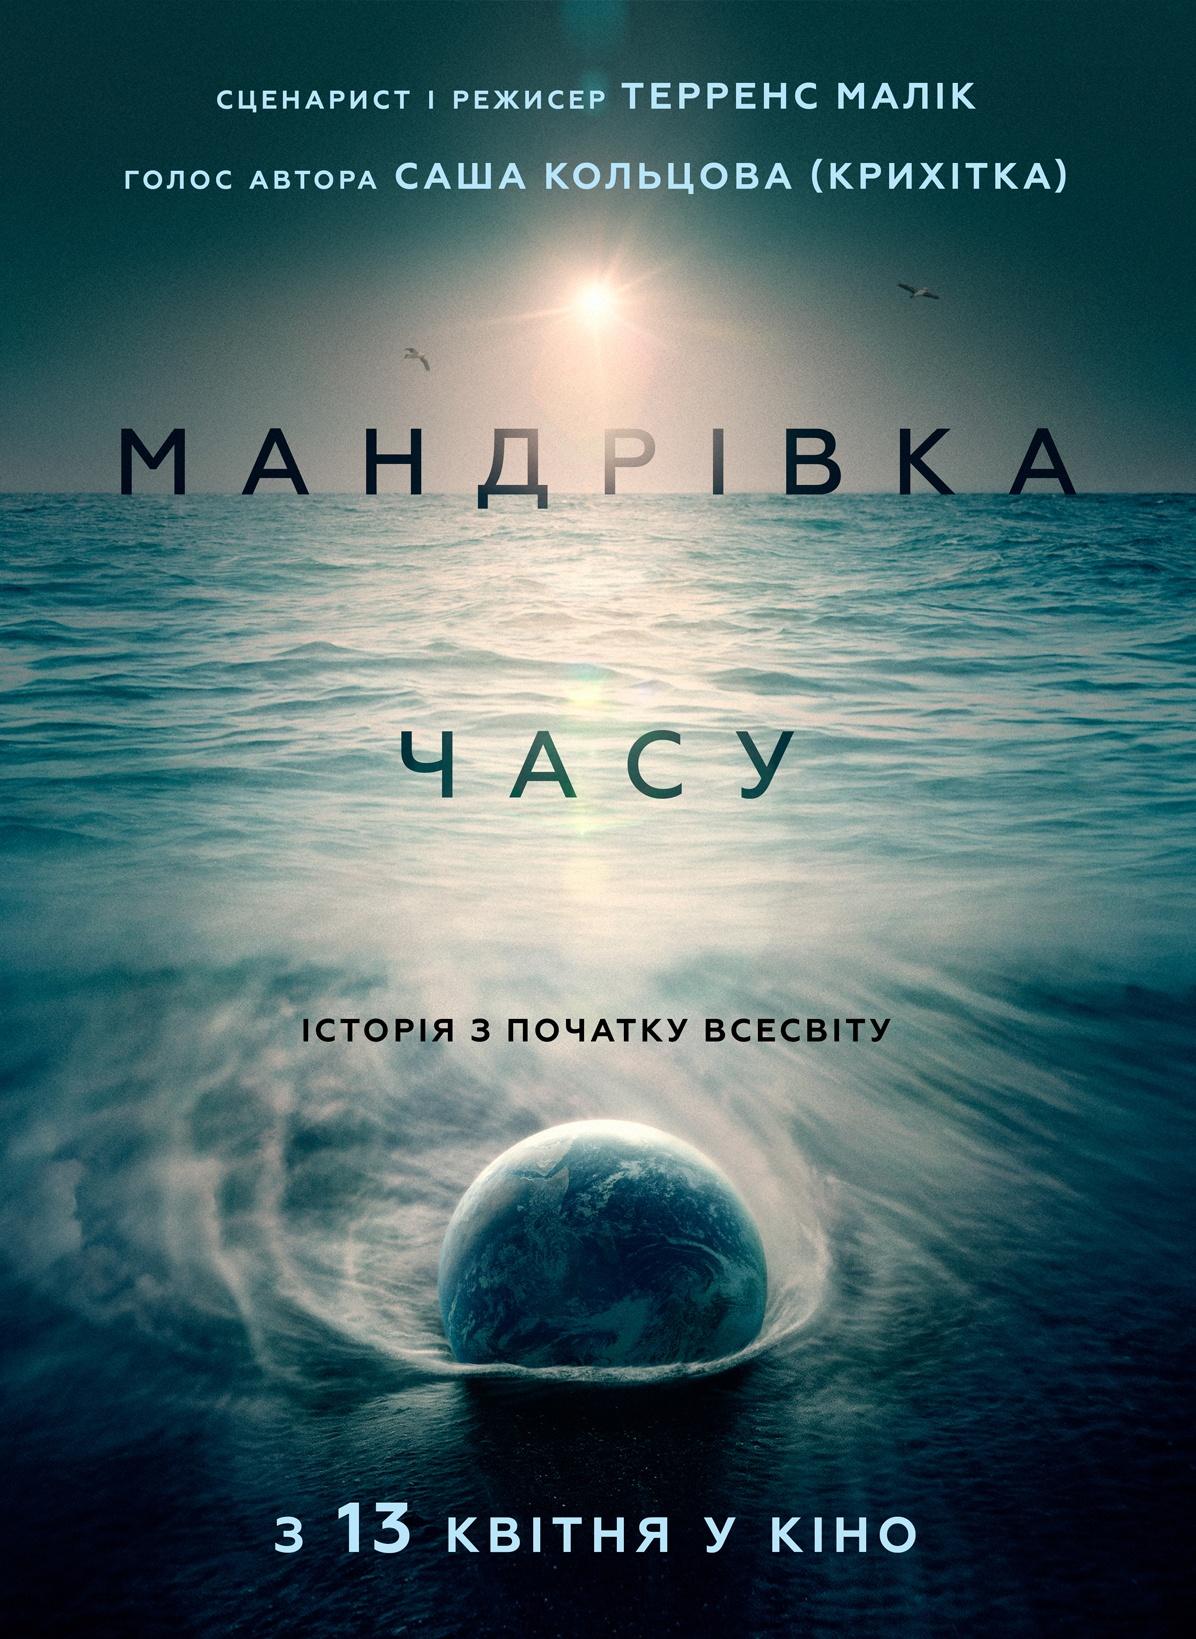 Путешествие времени - все о фильме на KINOafisha.ua! кейт бланшетт